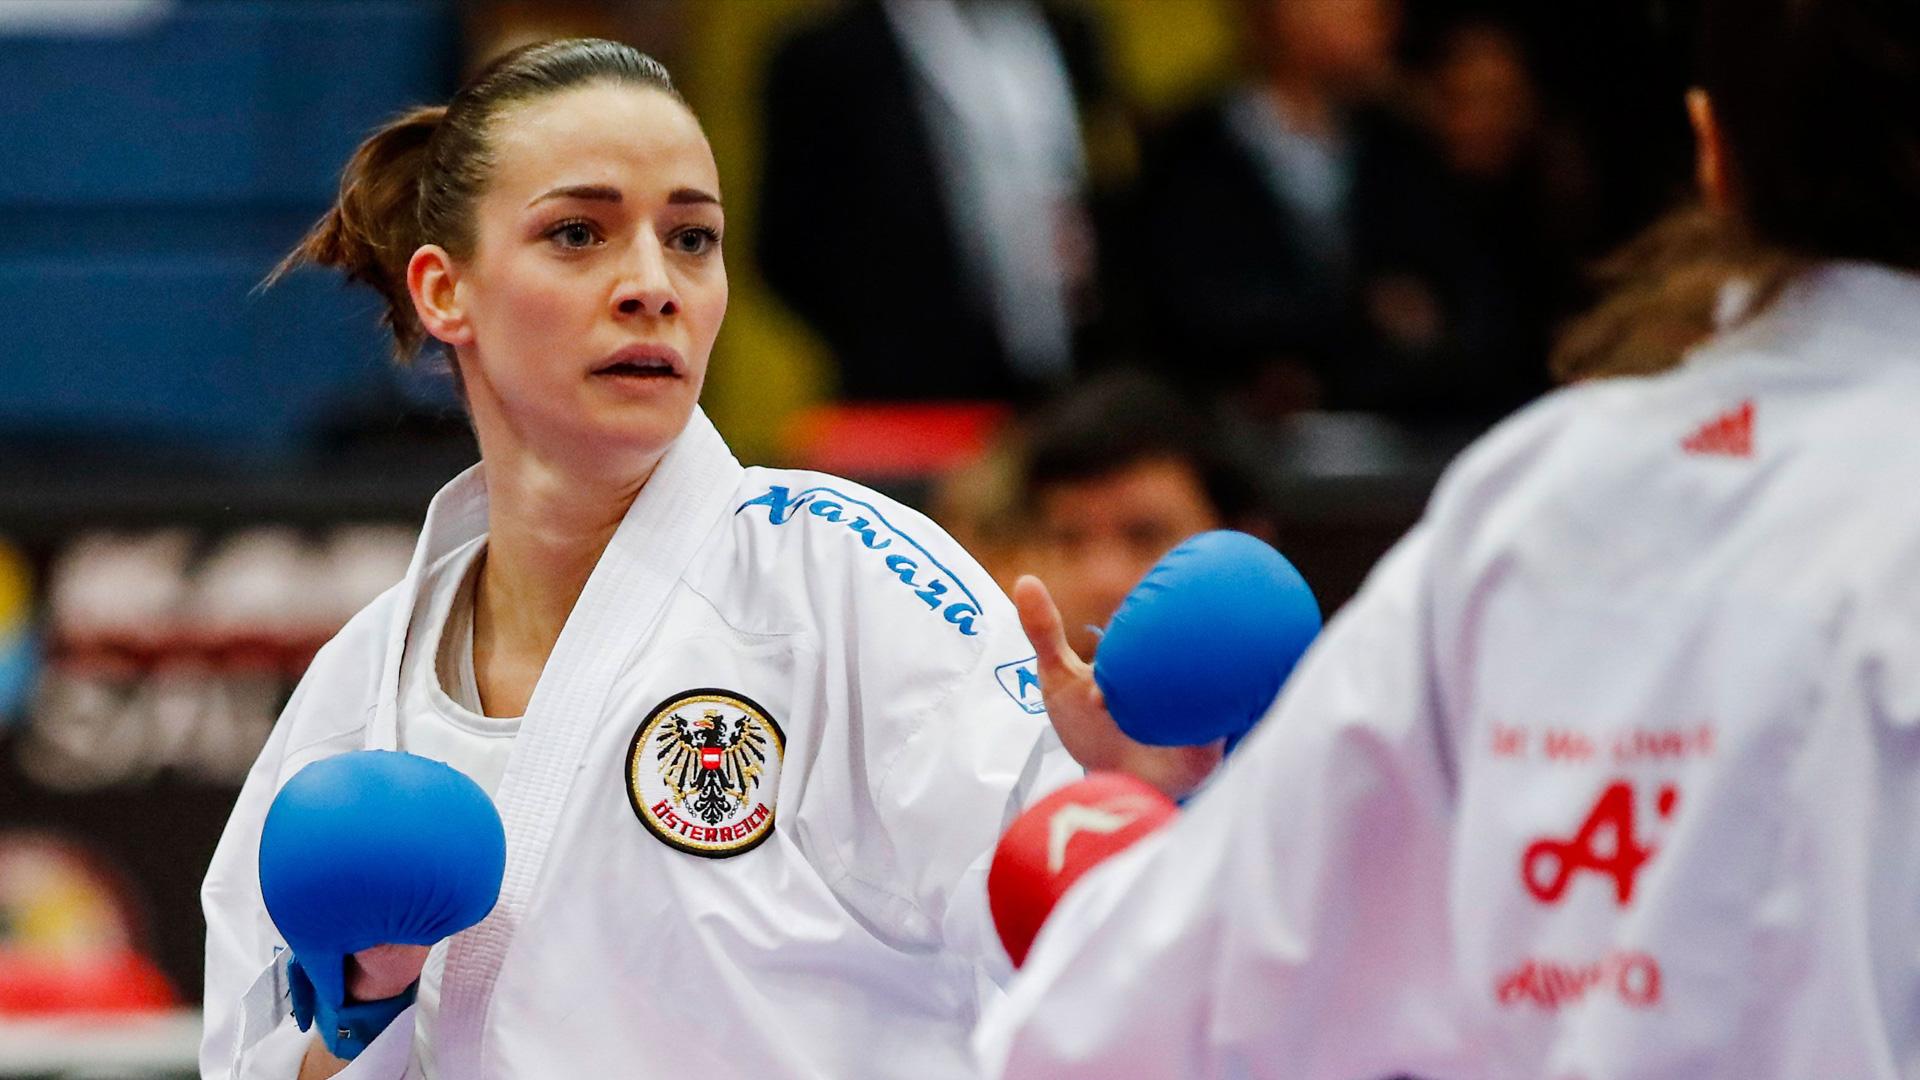 Bettina Plank | Olympia | Karate | Österreich